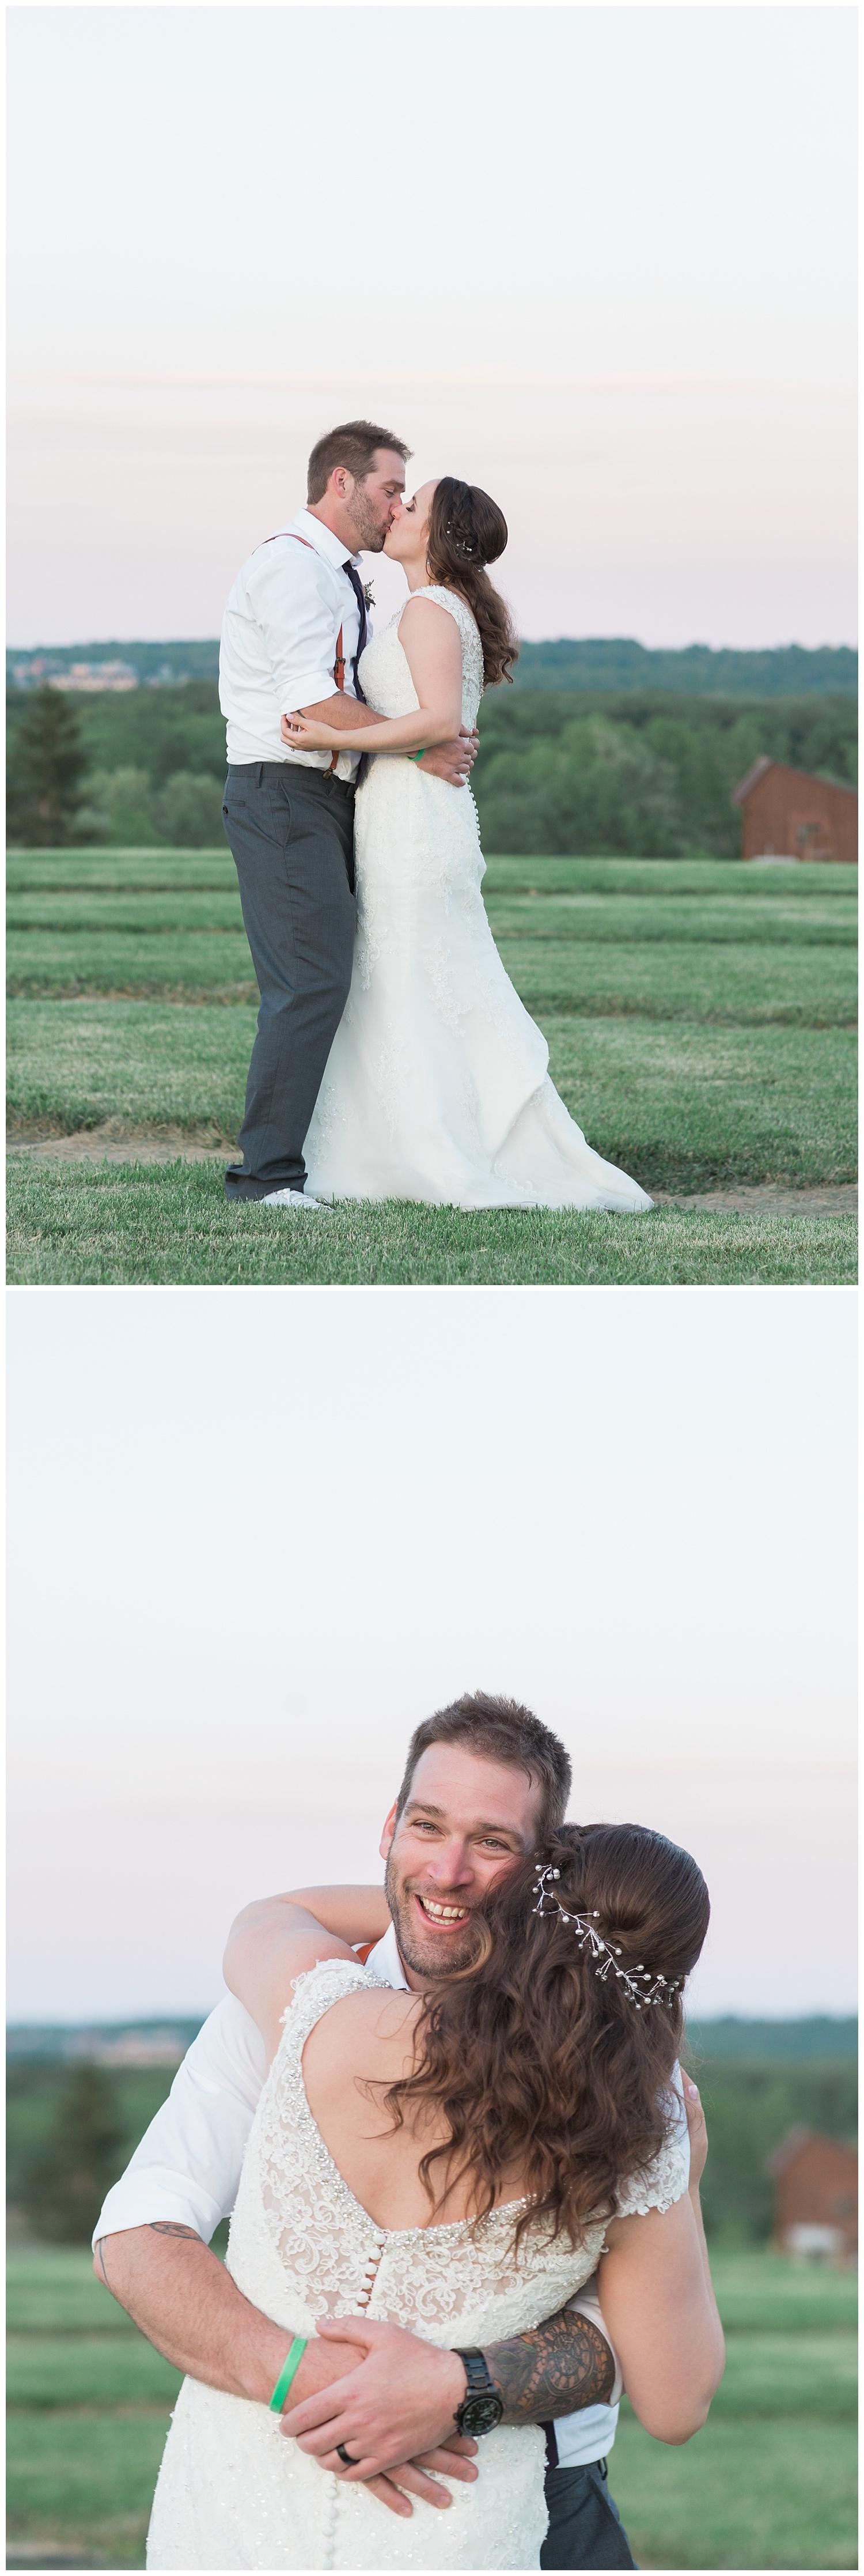 The Martin wedding - Lass & Beau-2113_Buffalo wedding photography.jpg